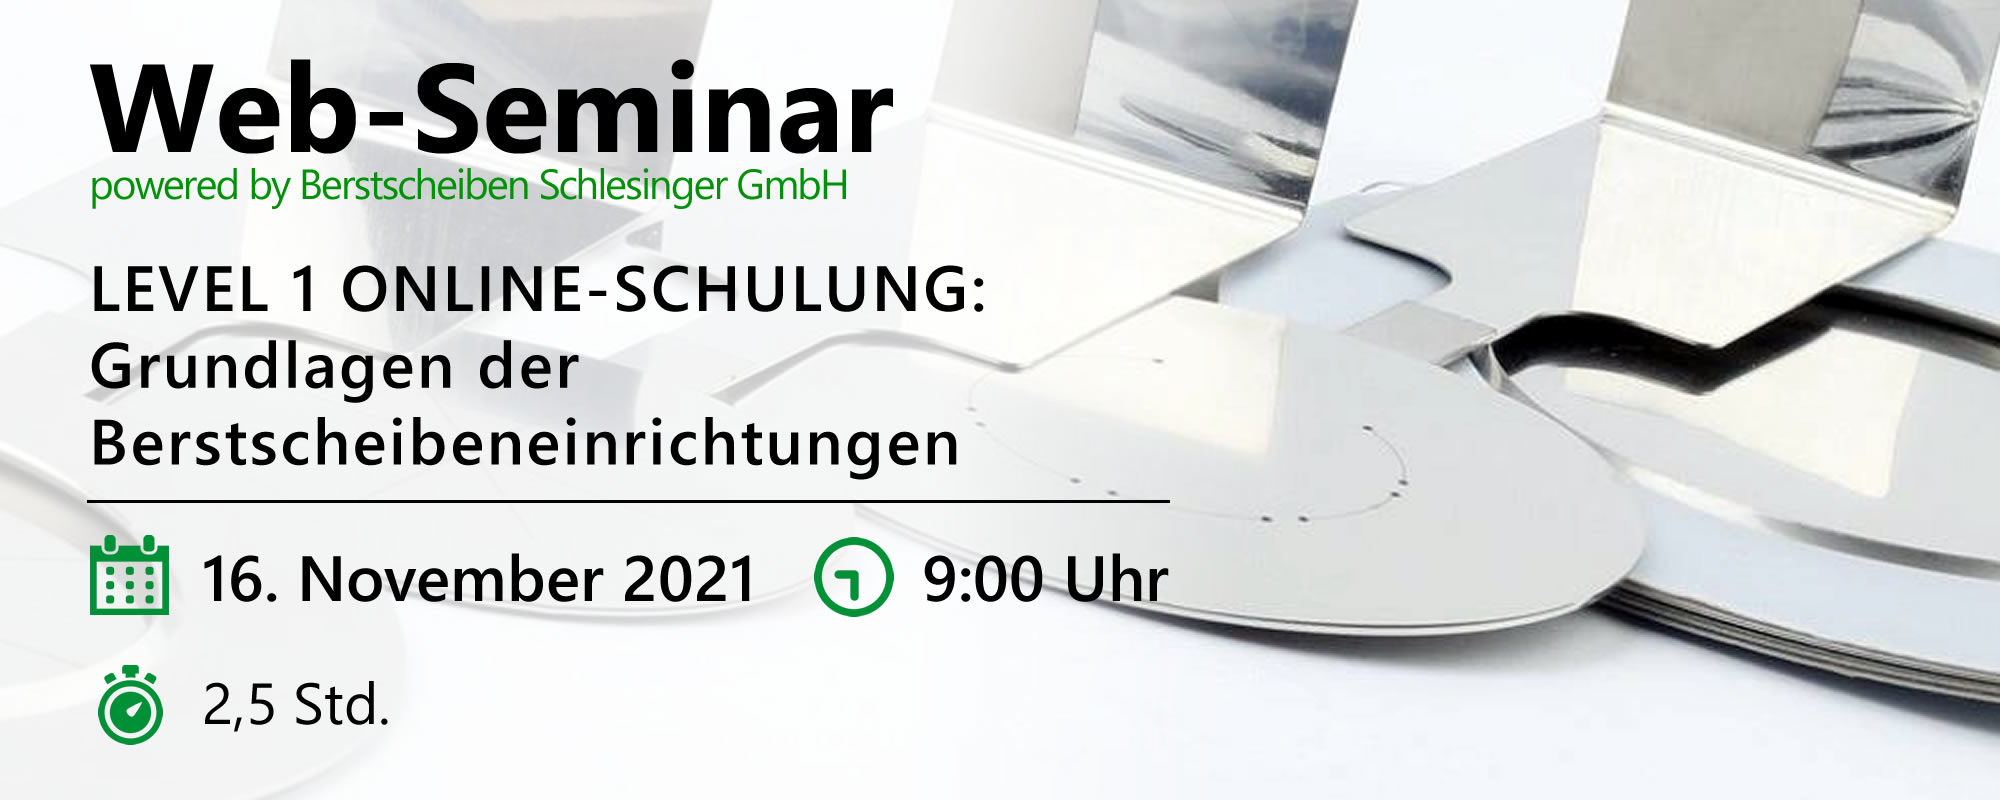 Web-Seminar am 16.11.2021